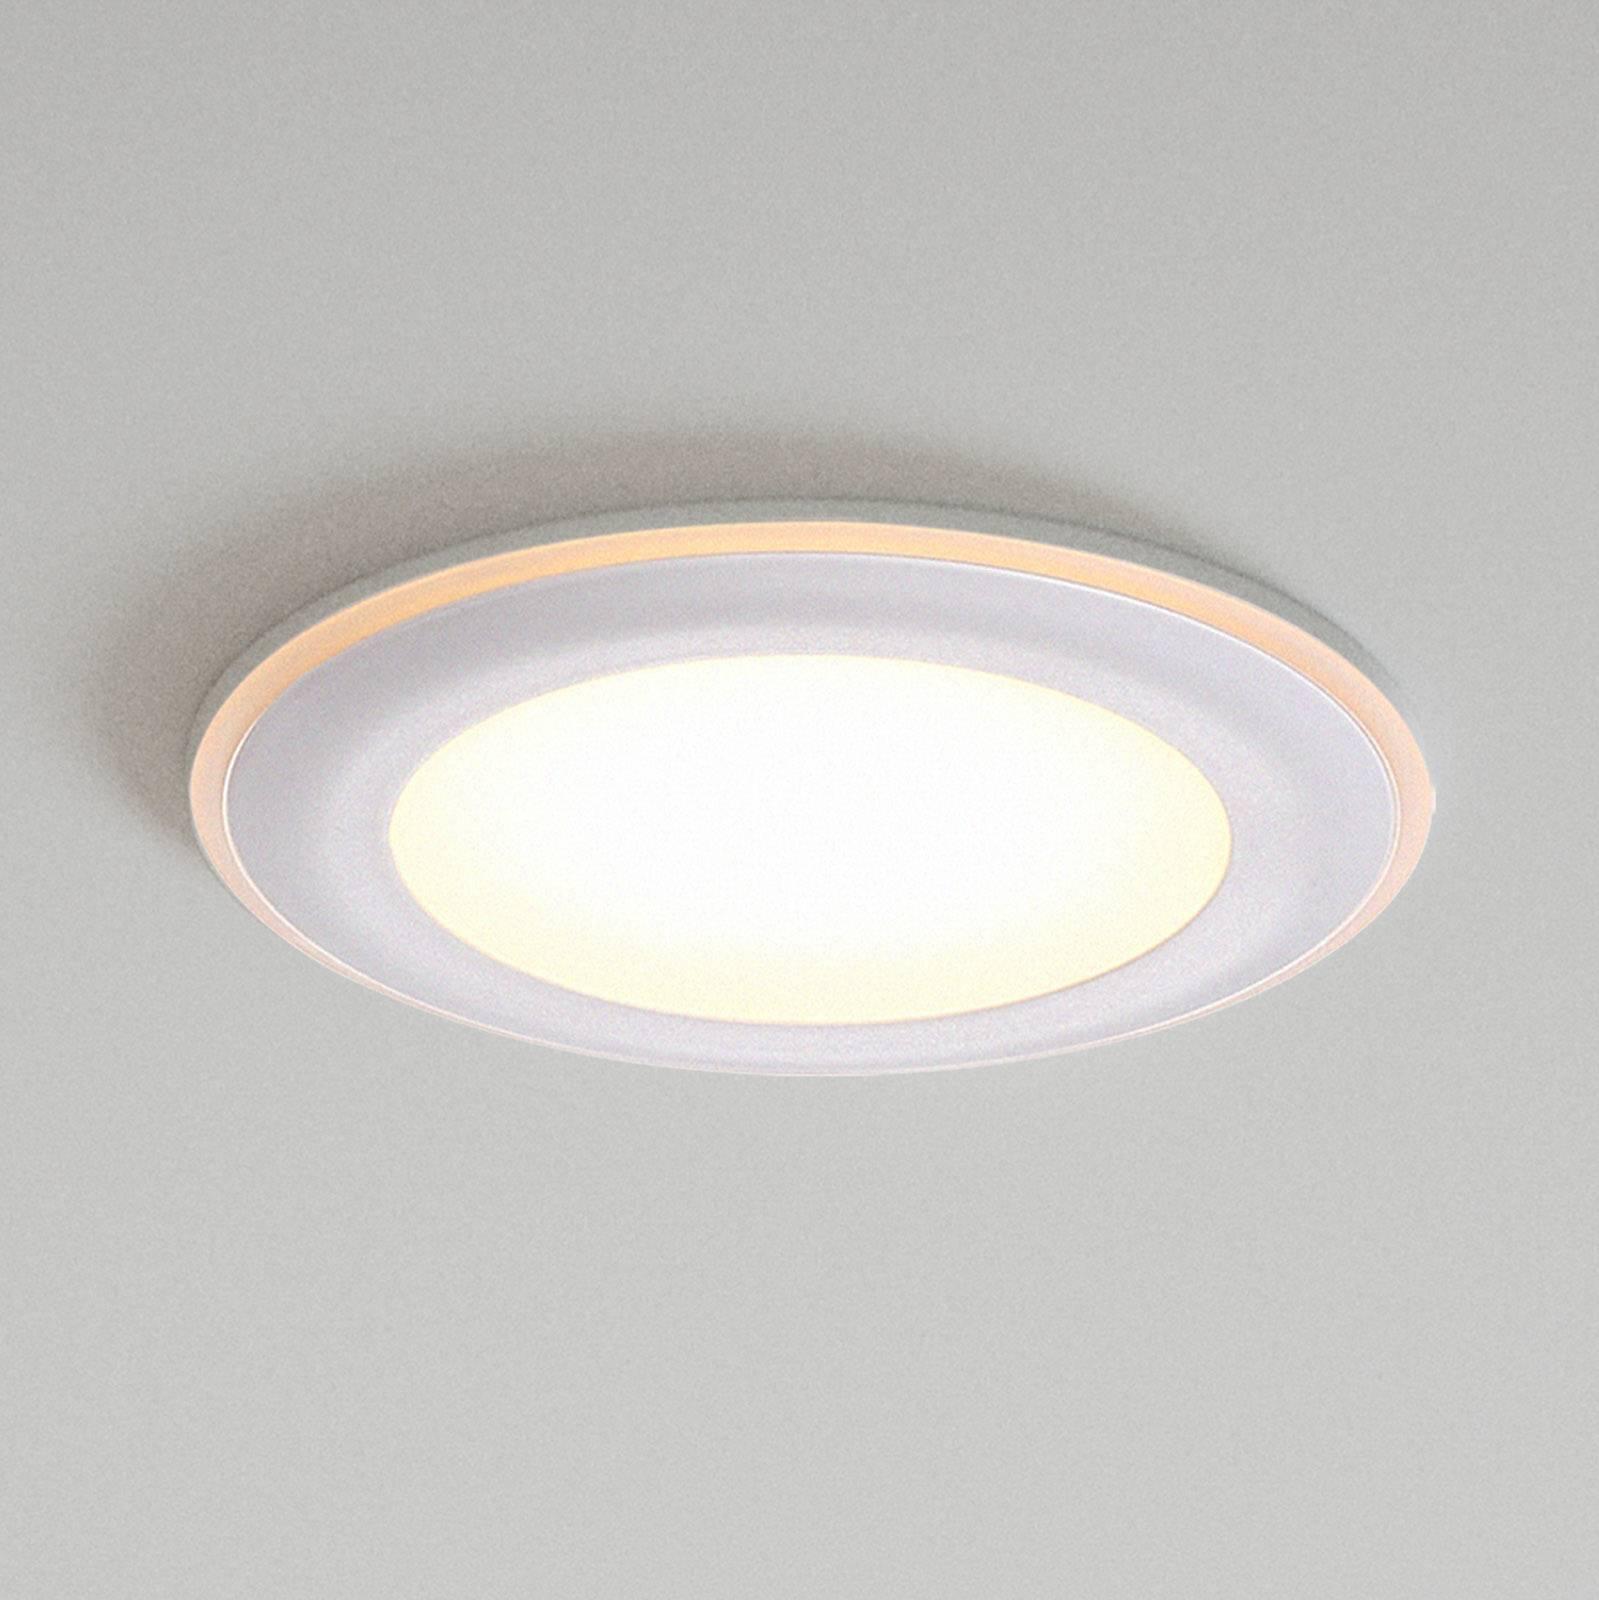 LED-kattouppovalaisin Elkton, Ø 8 cm